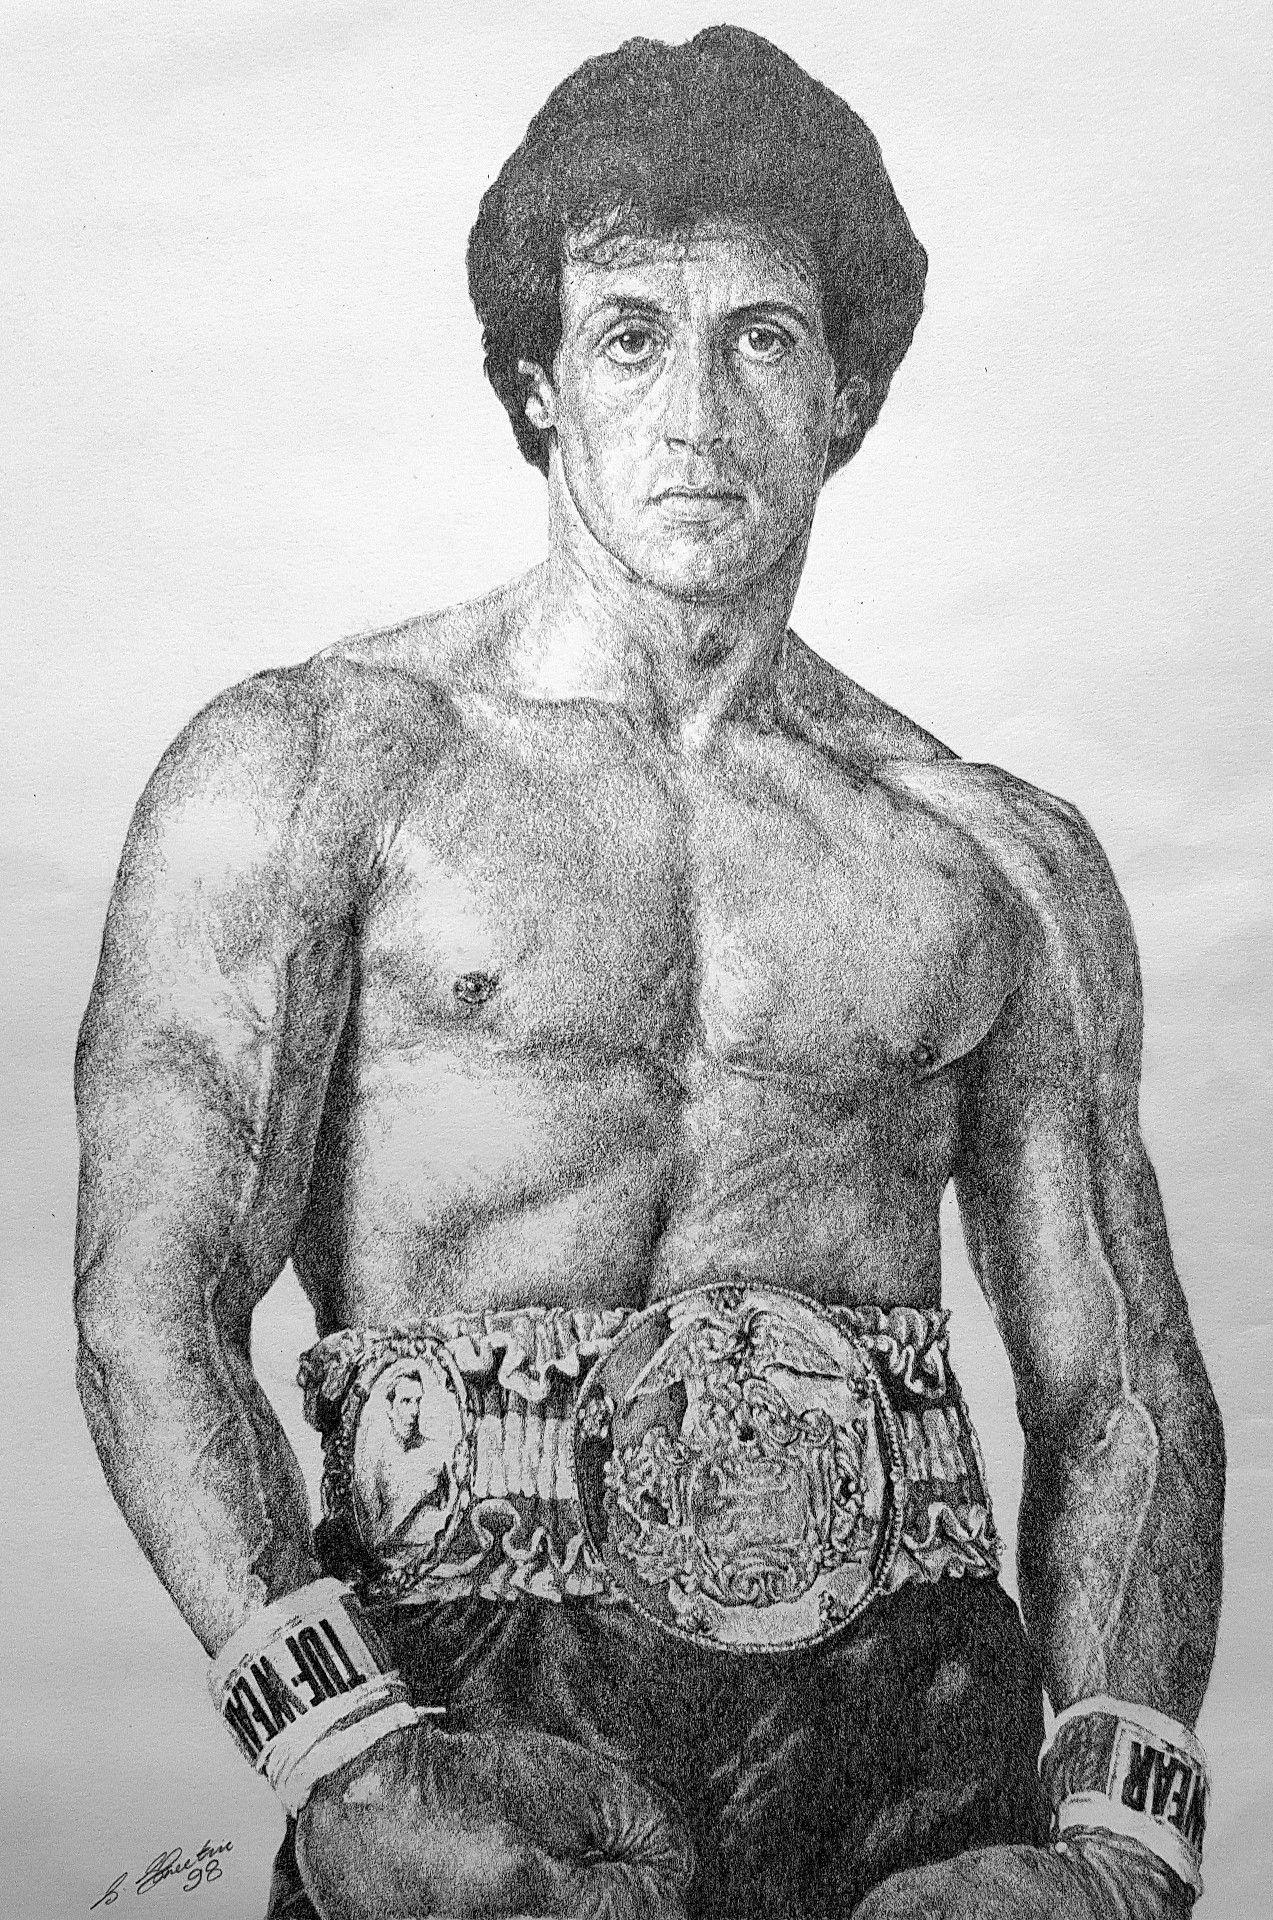 Sylvester Stallone In Pencil By Steven Streetin Celebrity Art